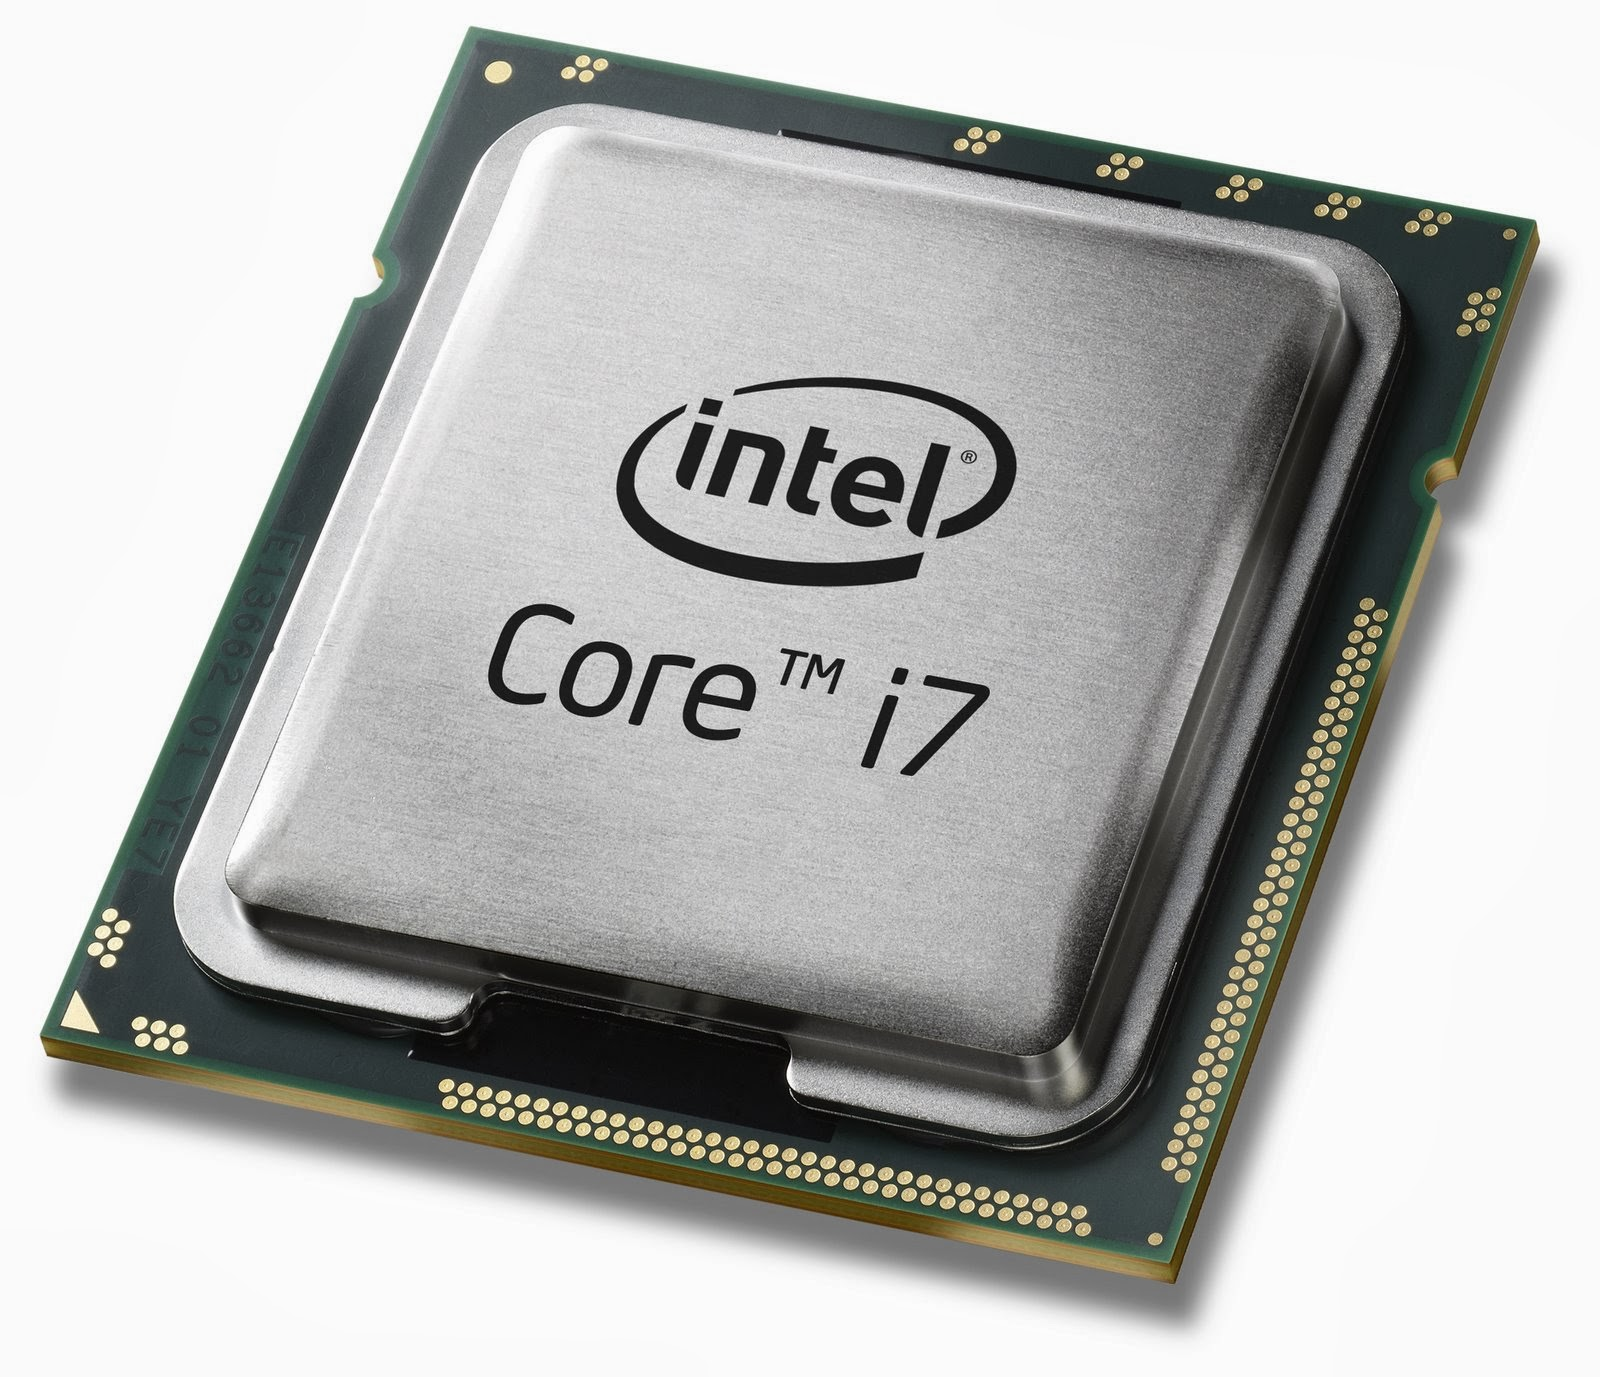 Процессор intel core i3-4170 (37 ghz, 3mb cache) s1150 box